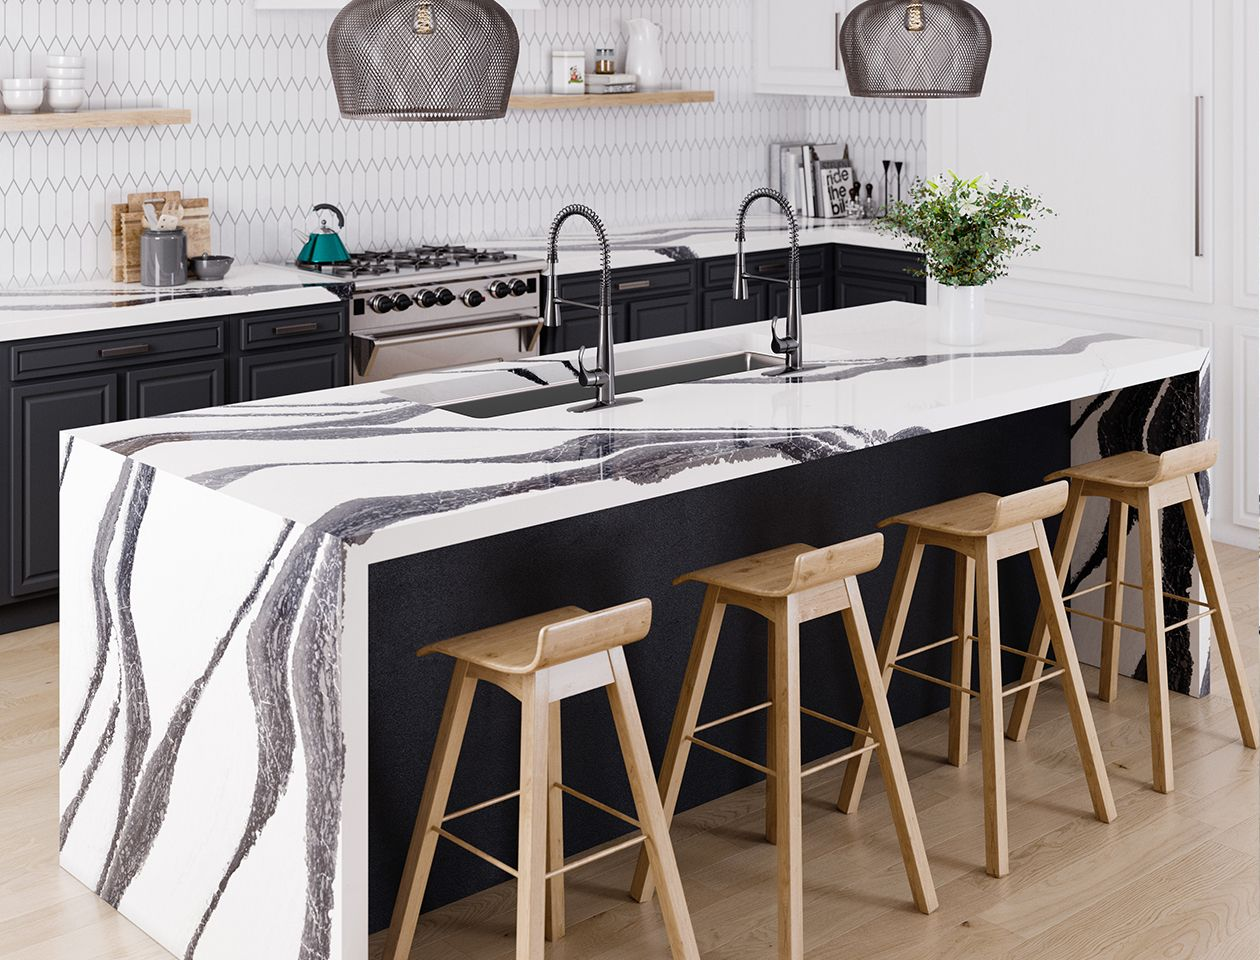 Bentley Quartz Cambria Countertop Inspiration Replacing Kitchen Countertops Kitchen Design